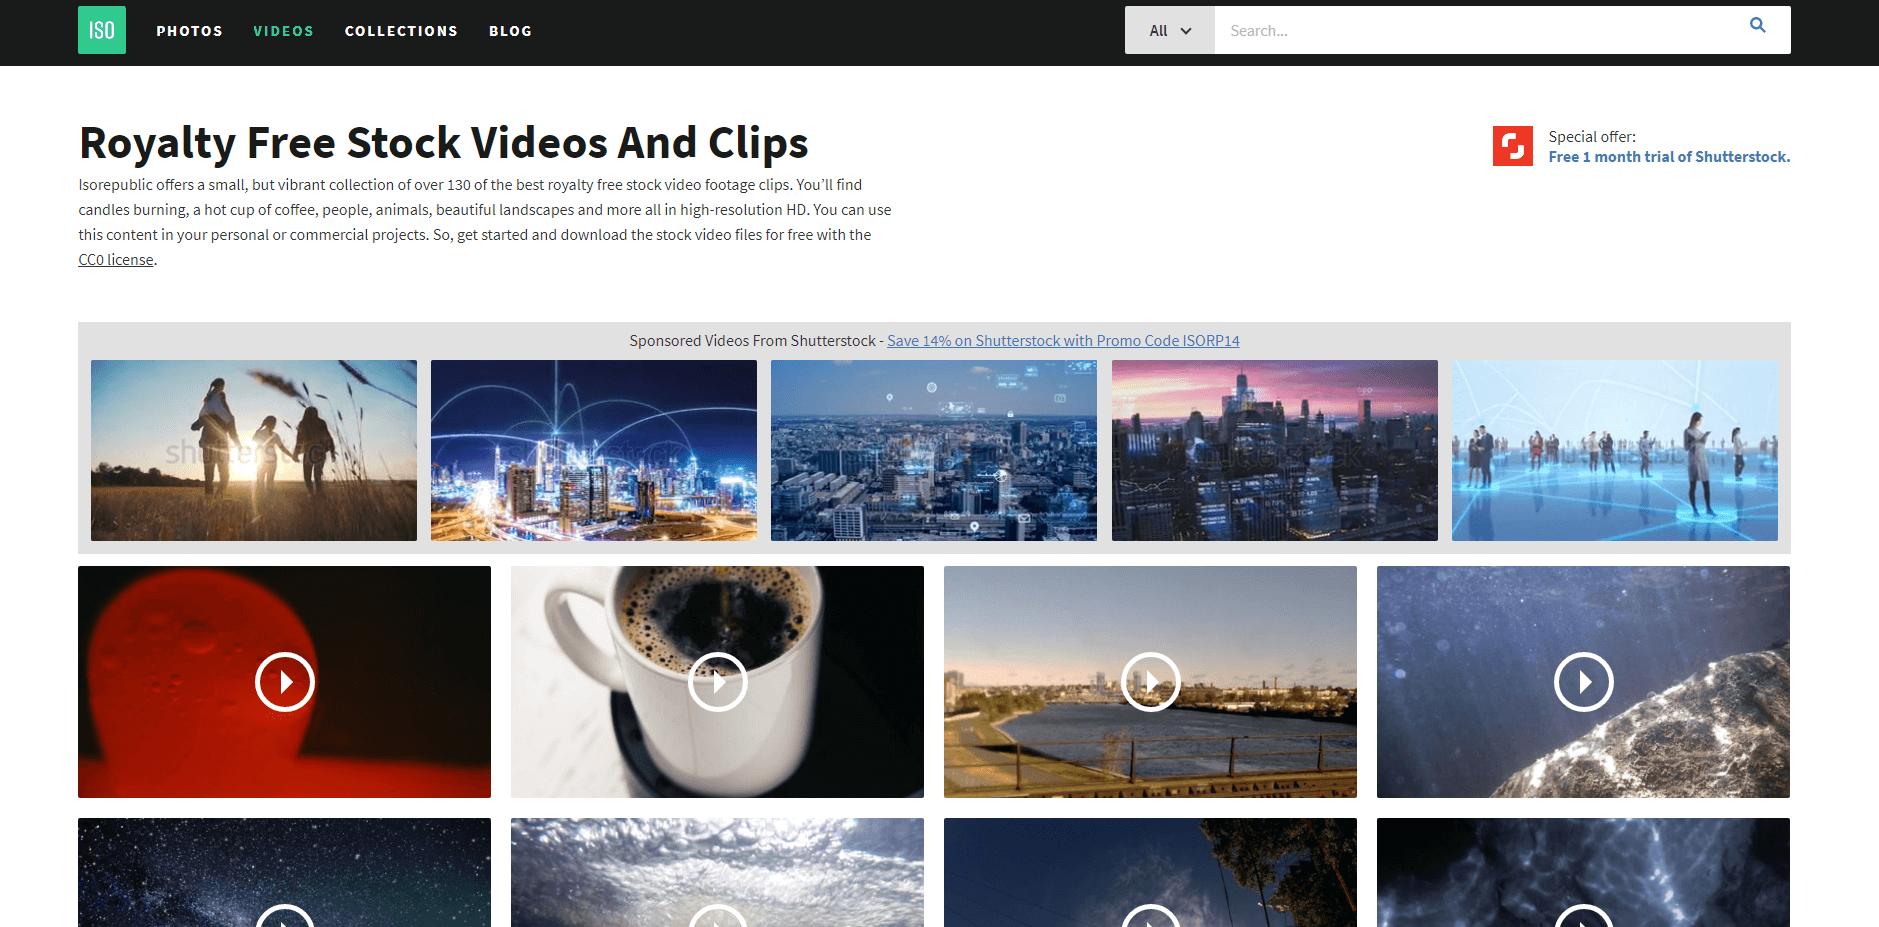 stock photos and videos